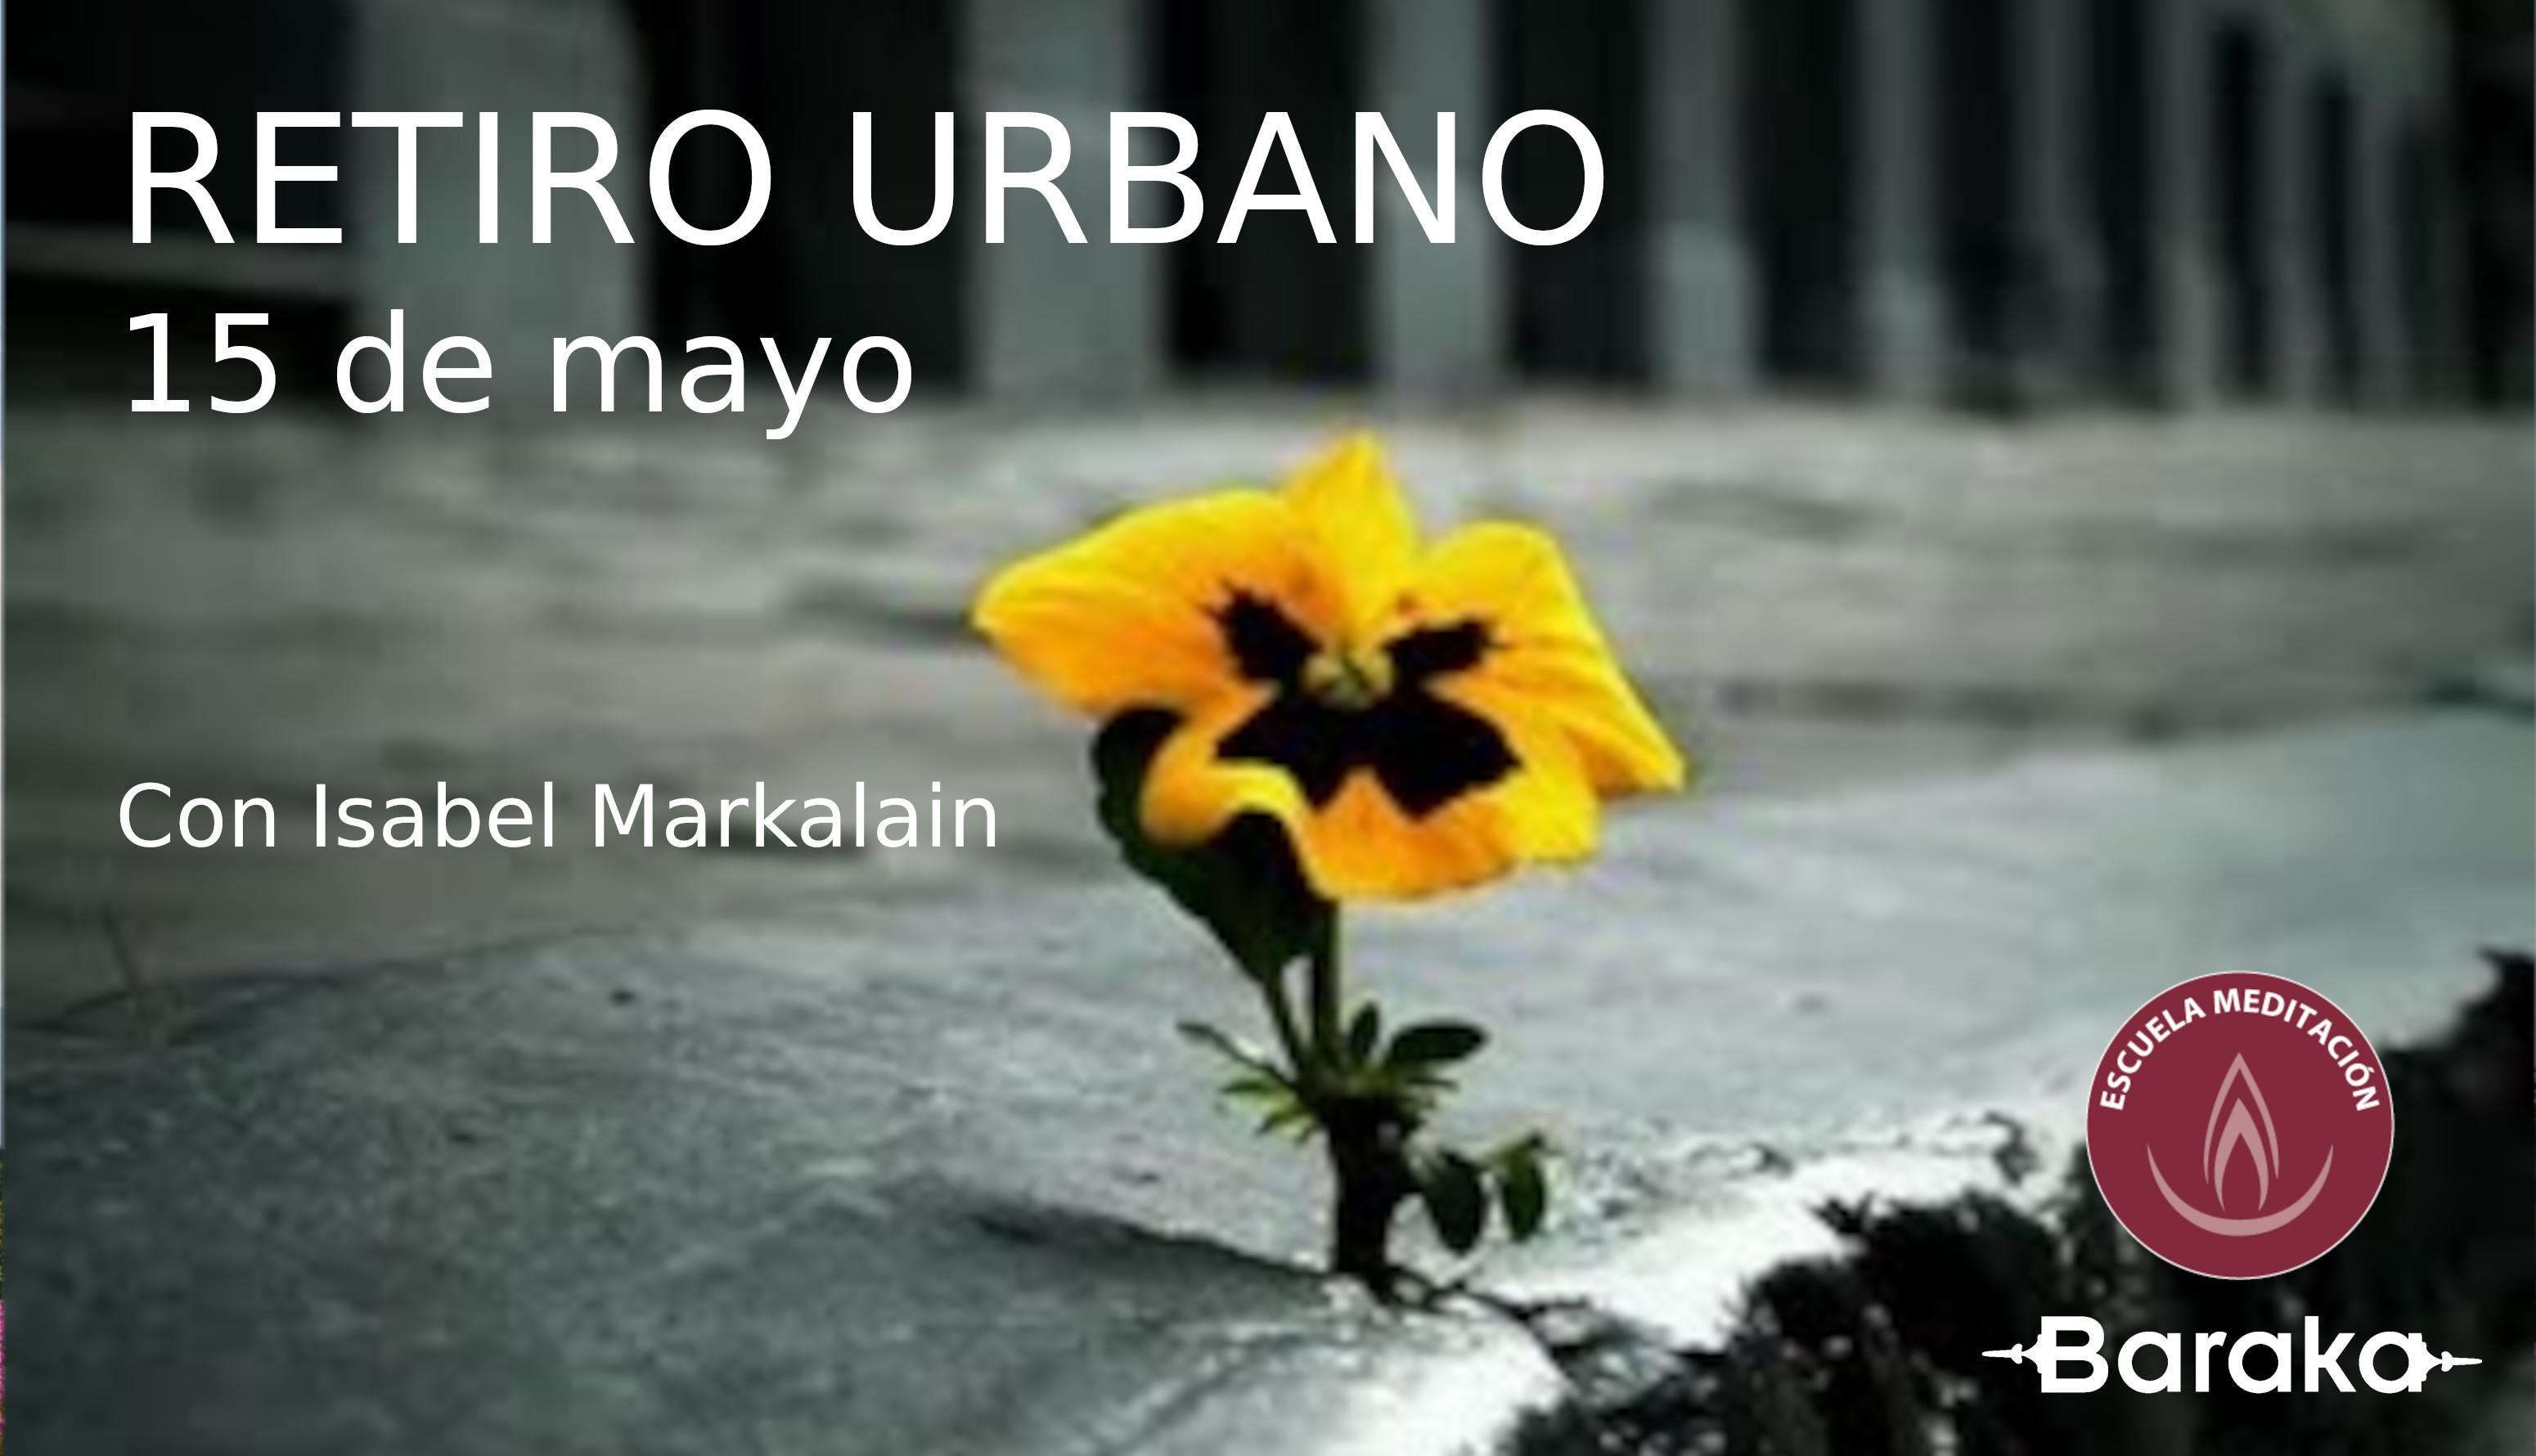 retiro urbano 15 de mayo